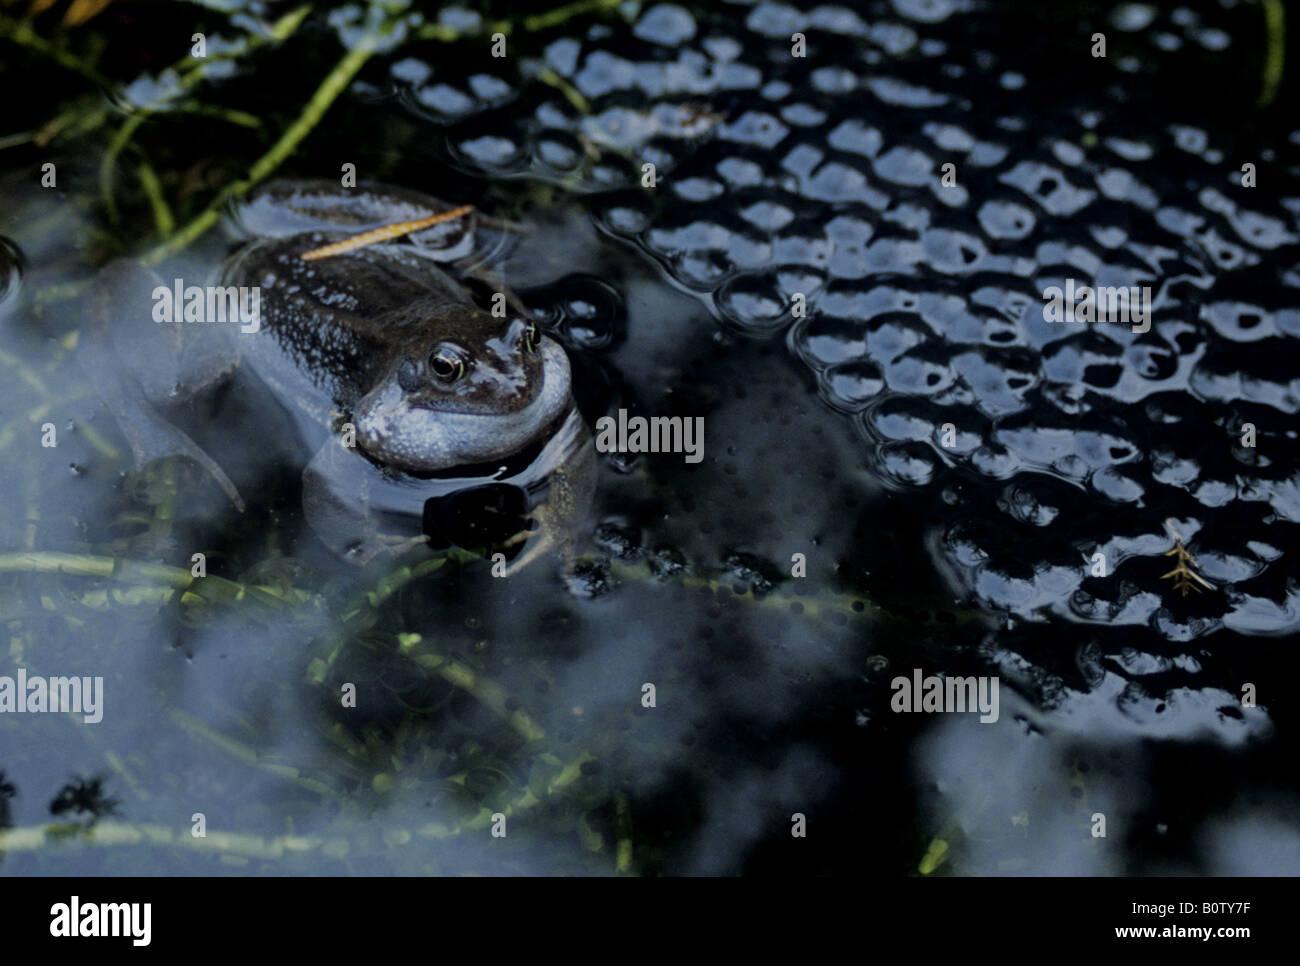 Frog Croaking Amongst New Spawn - Stock Image